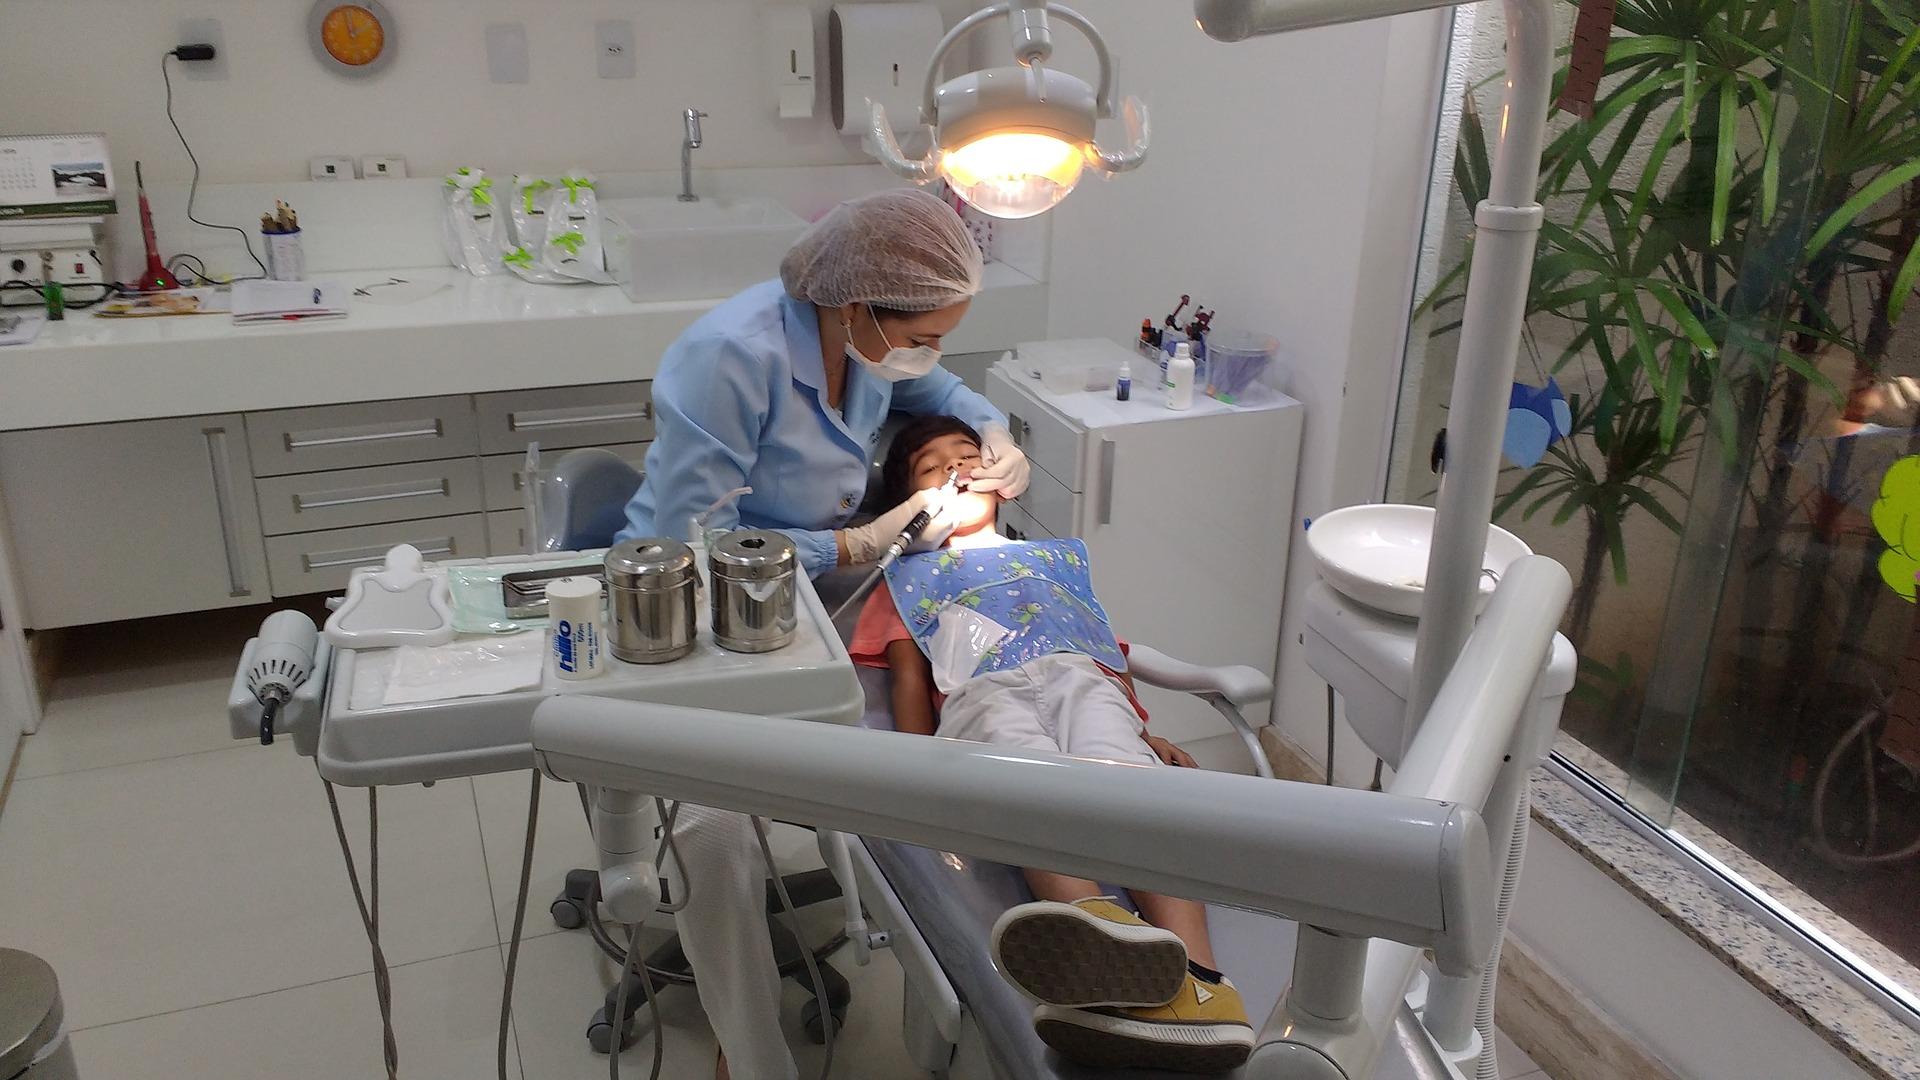 d-ale-stomatologilor-cum-sa-abordezi-corect-pacientii-copii